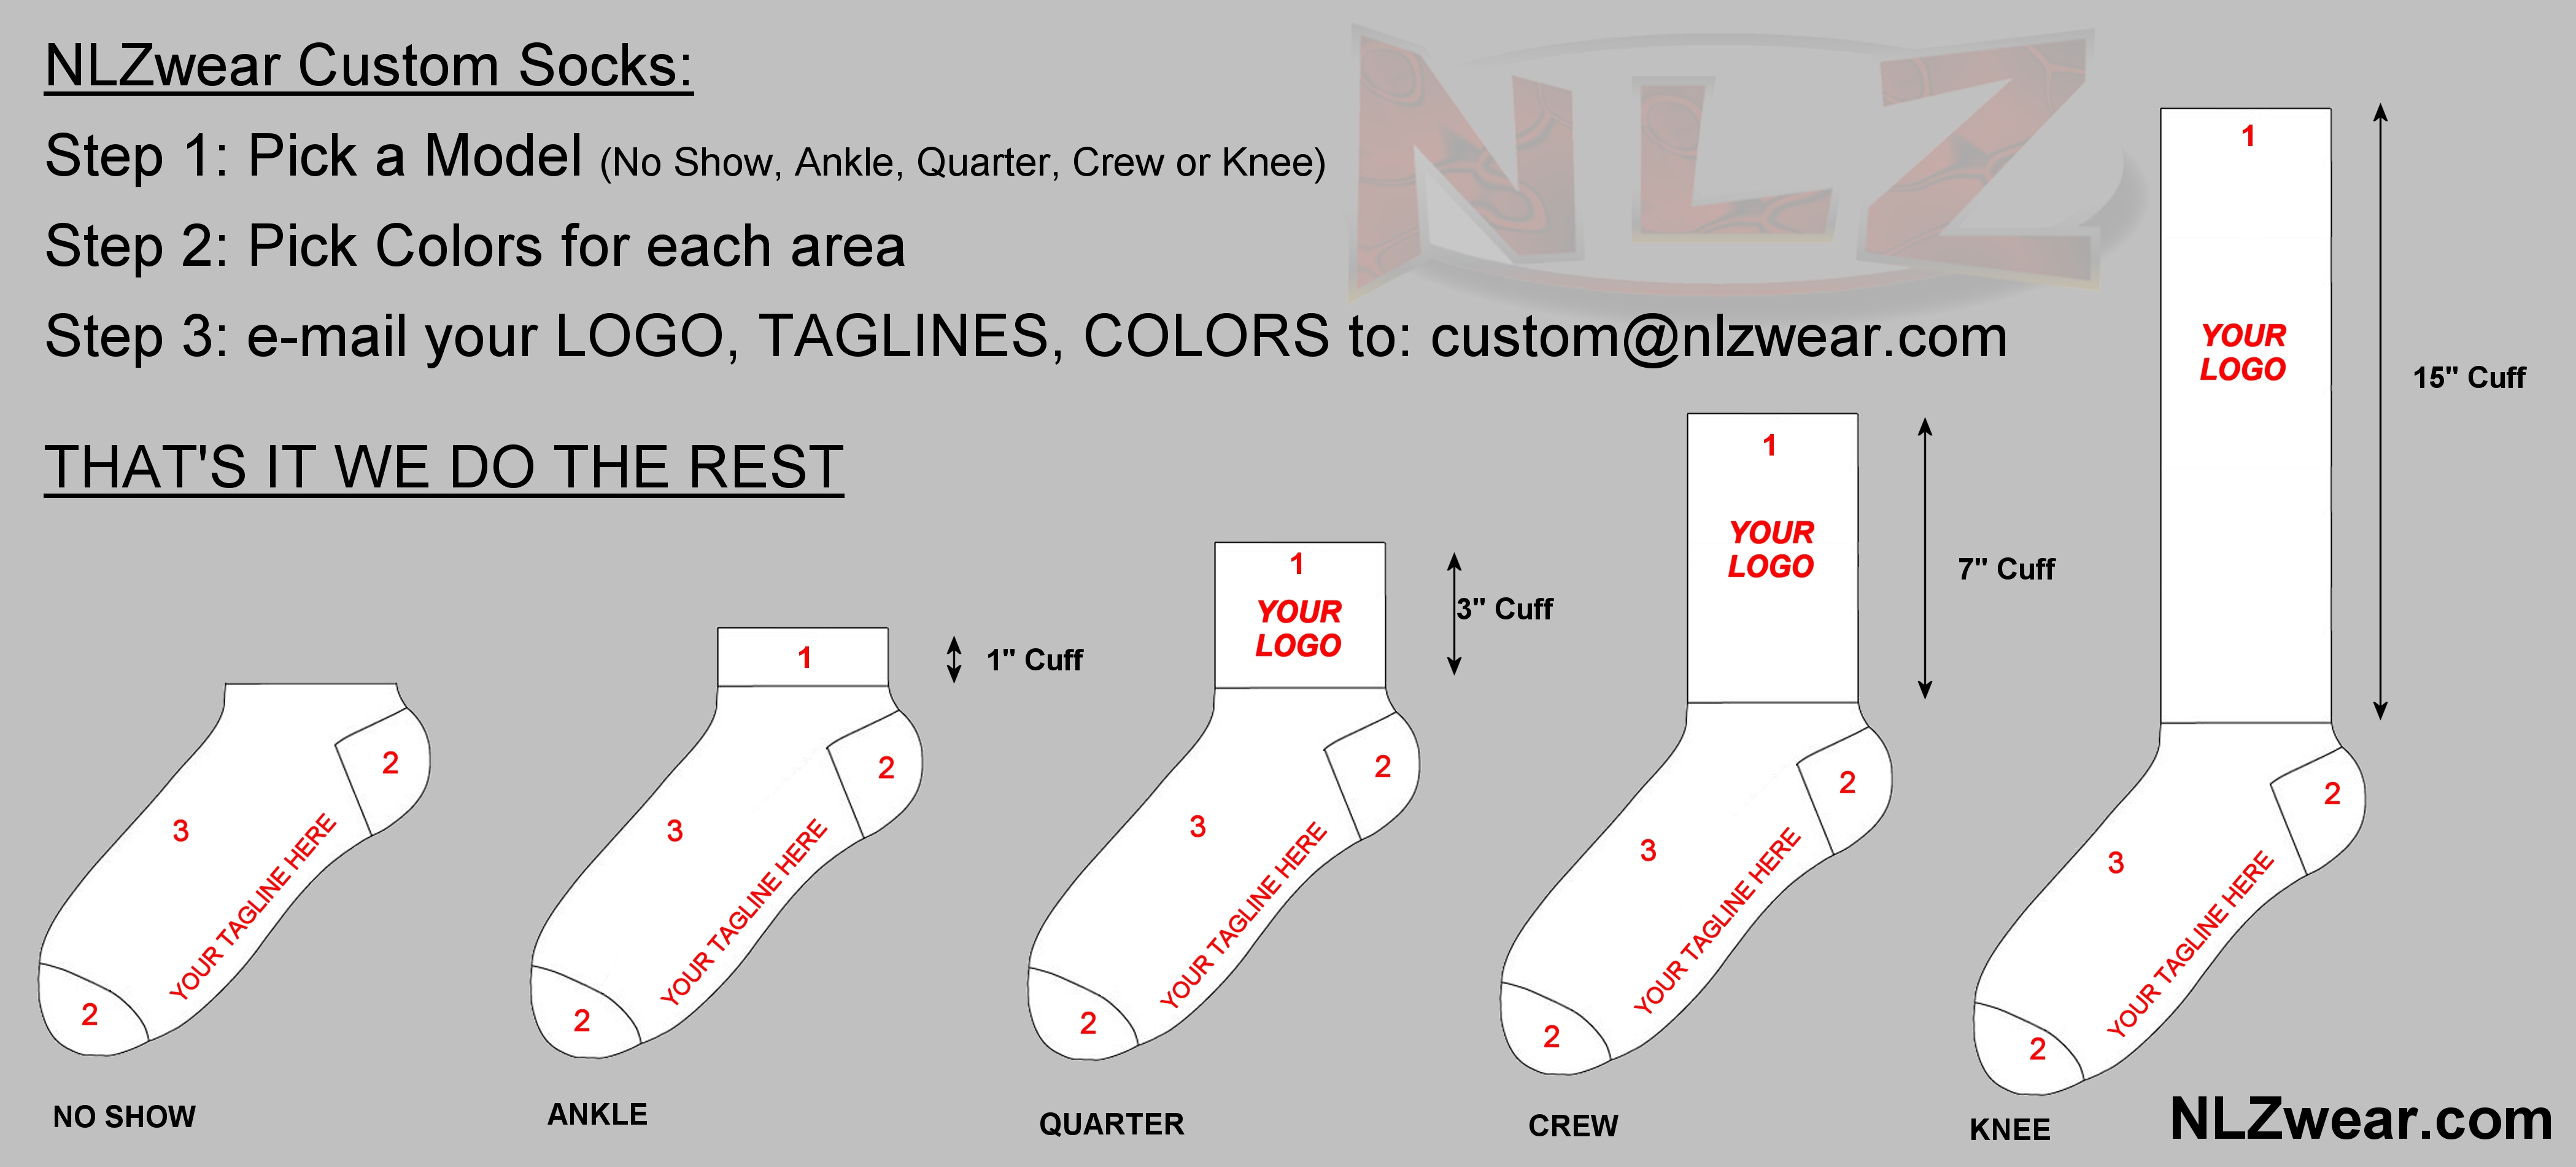 custom hiking socks nlzwear. Black Bedroom Furniture Sets. Home Design Ideas